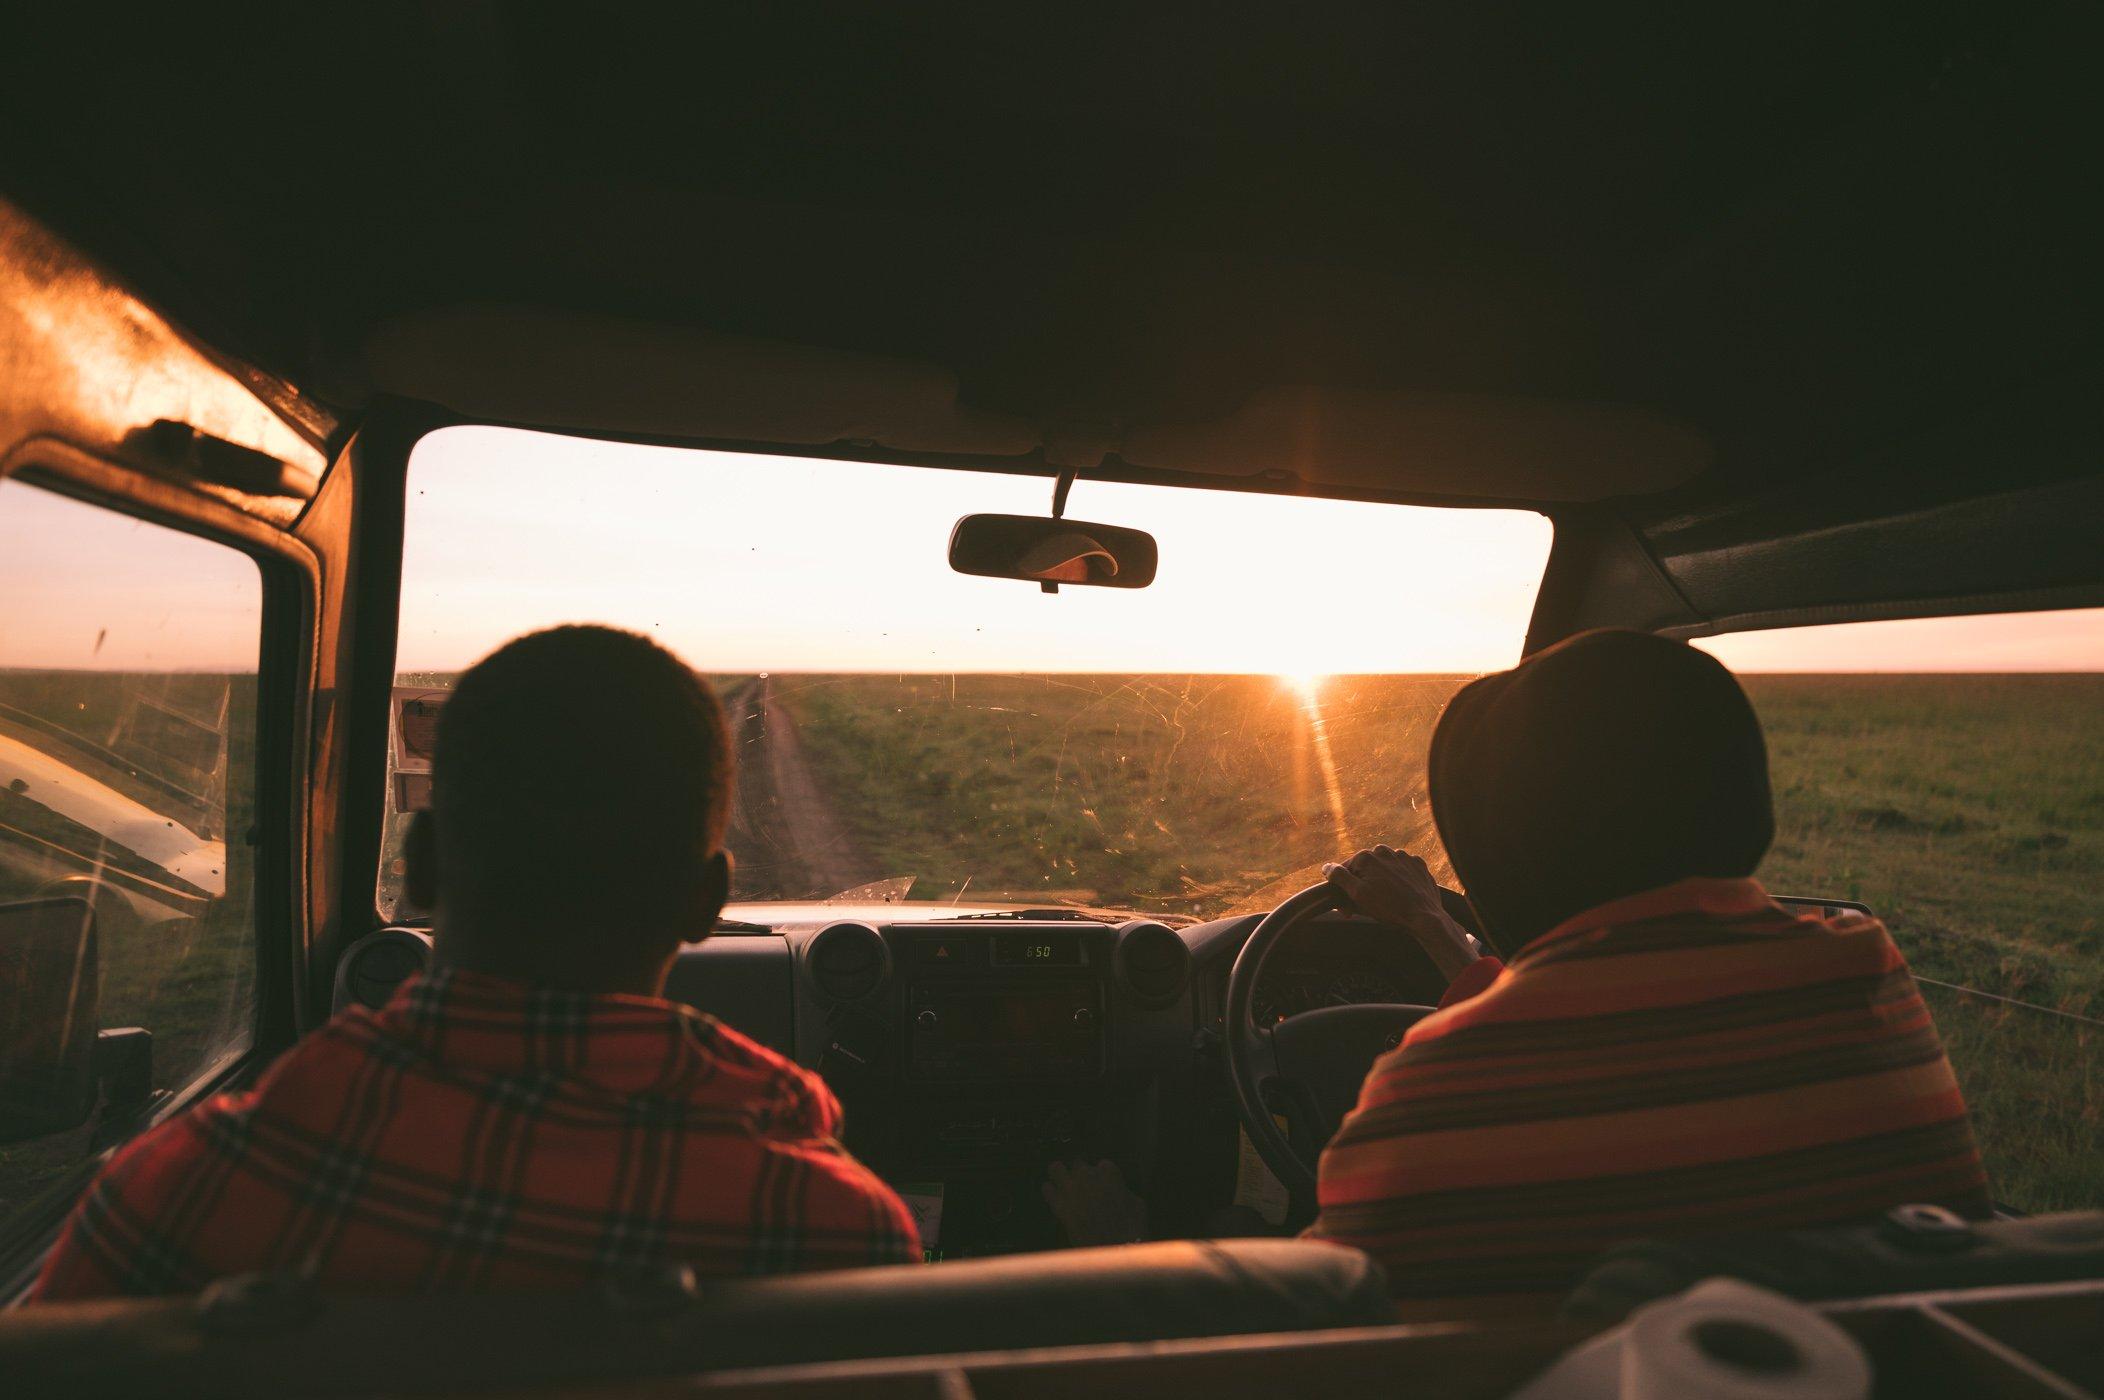 Early morning game drive in the Maasai Mara in Kenya